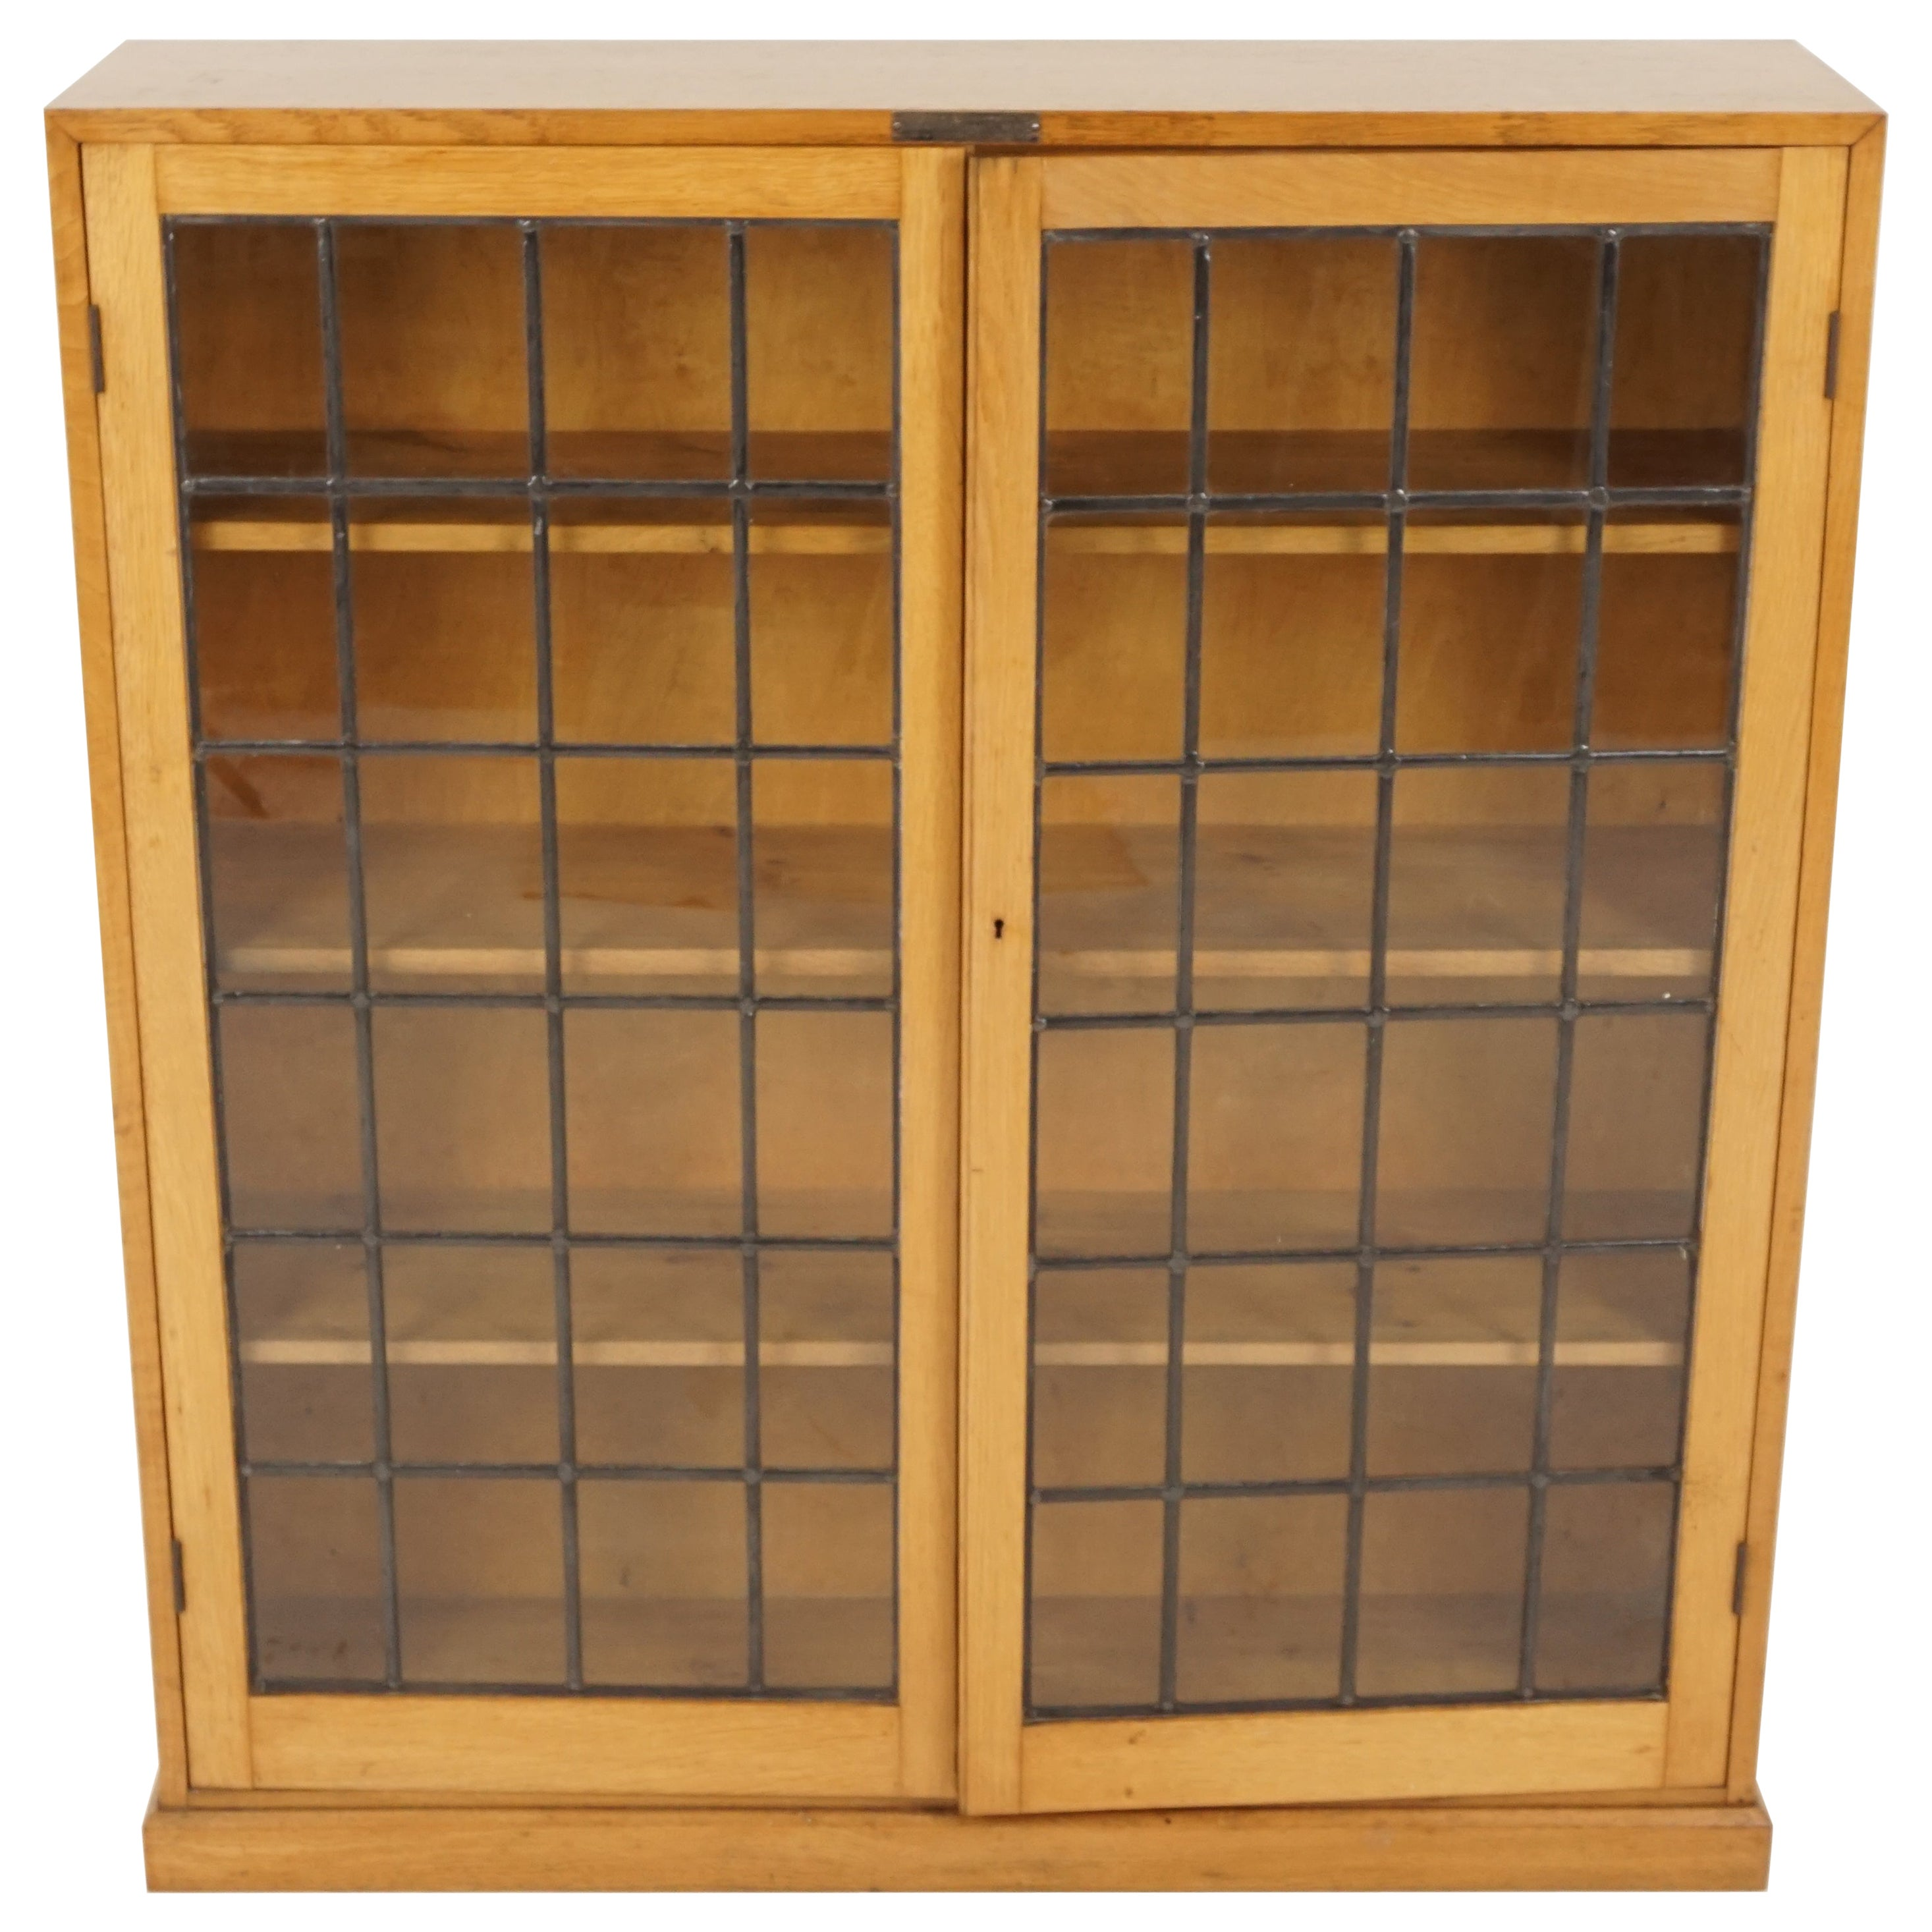 Vintage Golden Oak Bookcase, Leaded Glass Display Cabinet, Scotland 1930, B2239